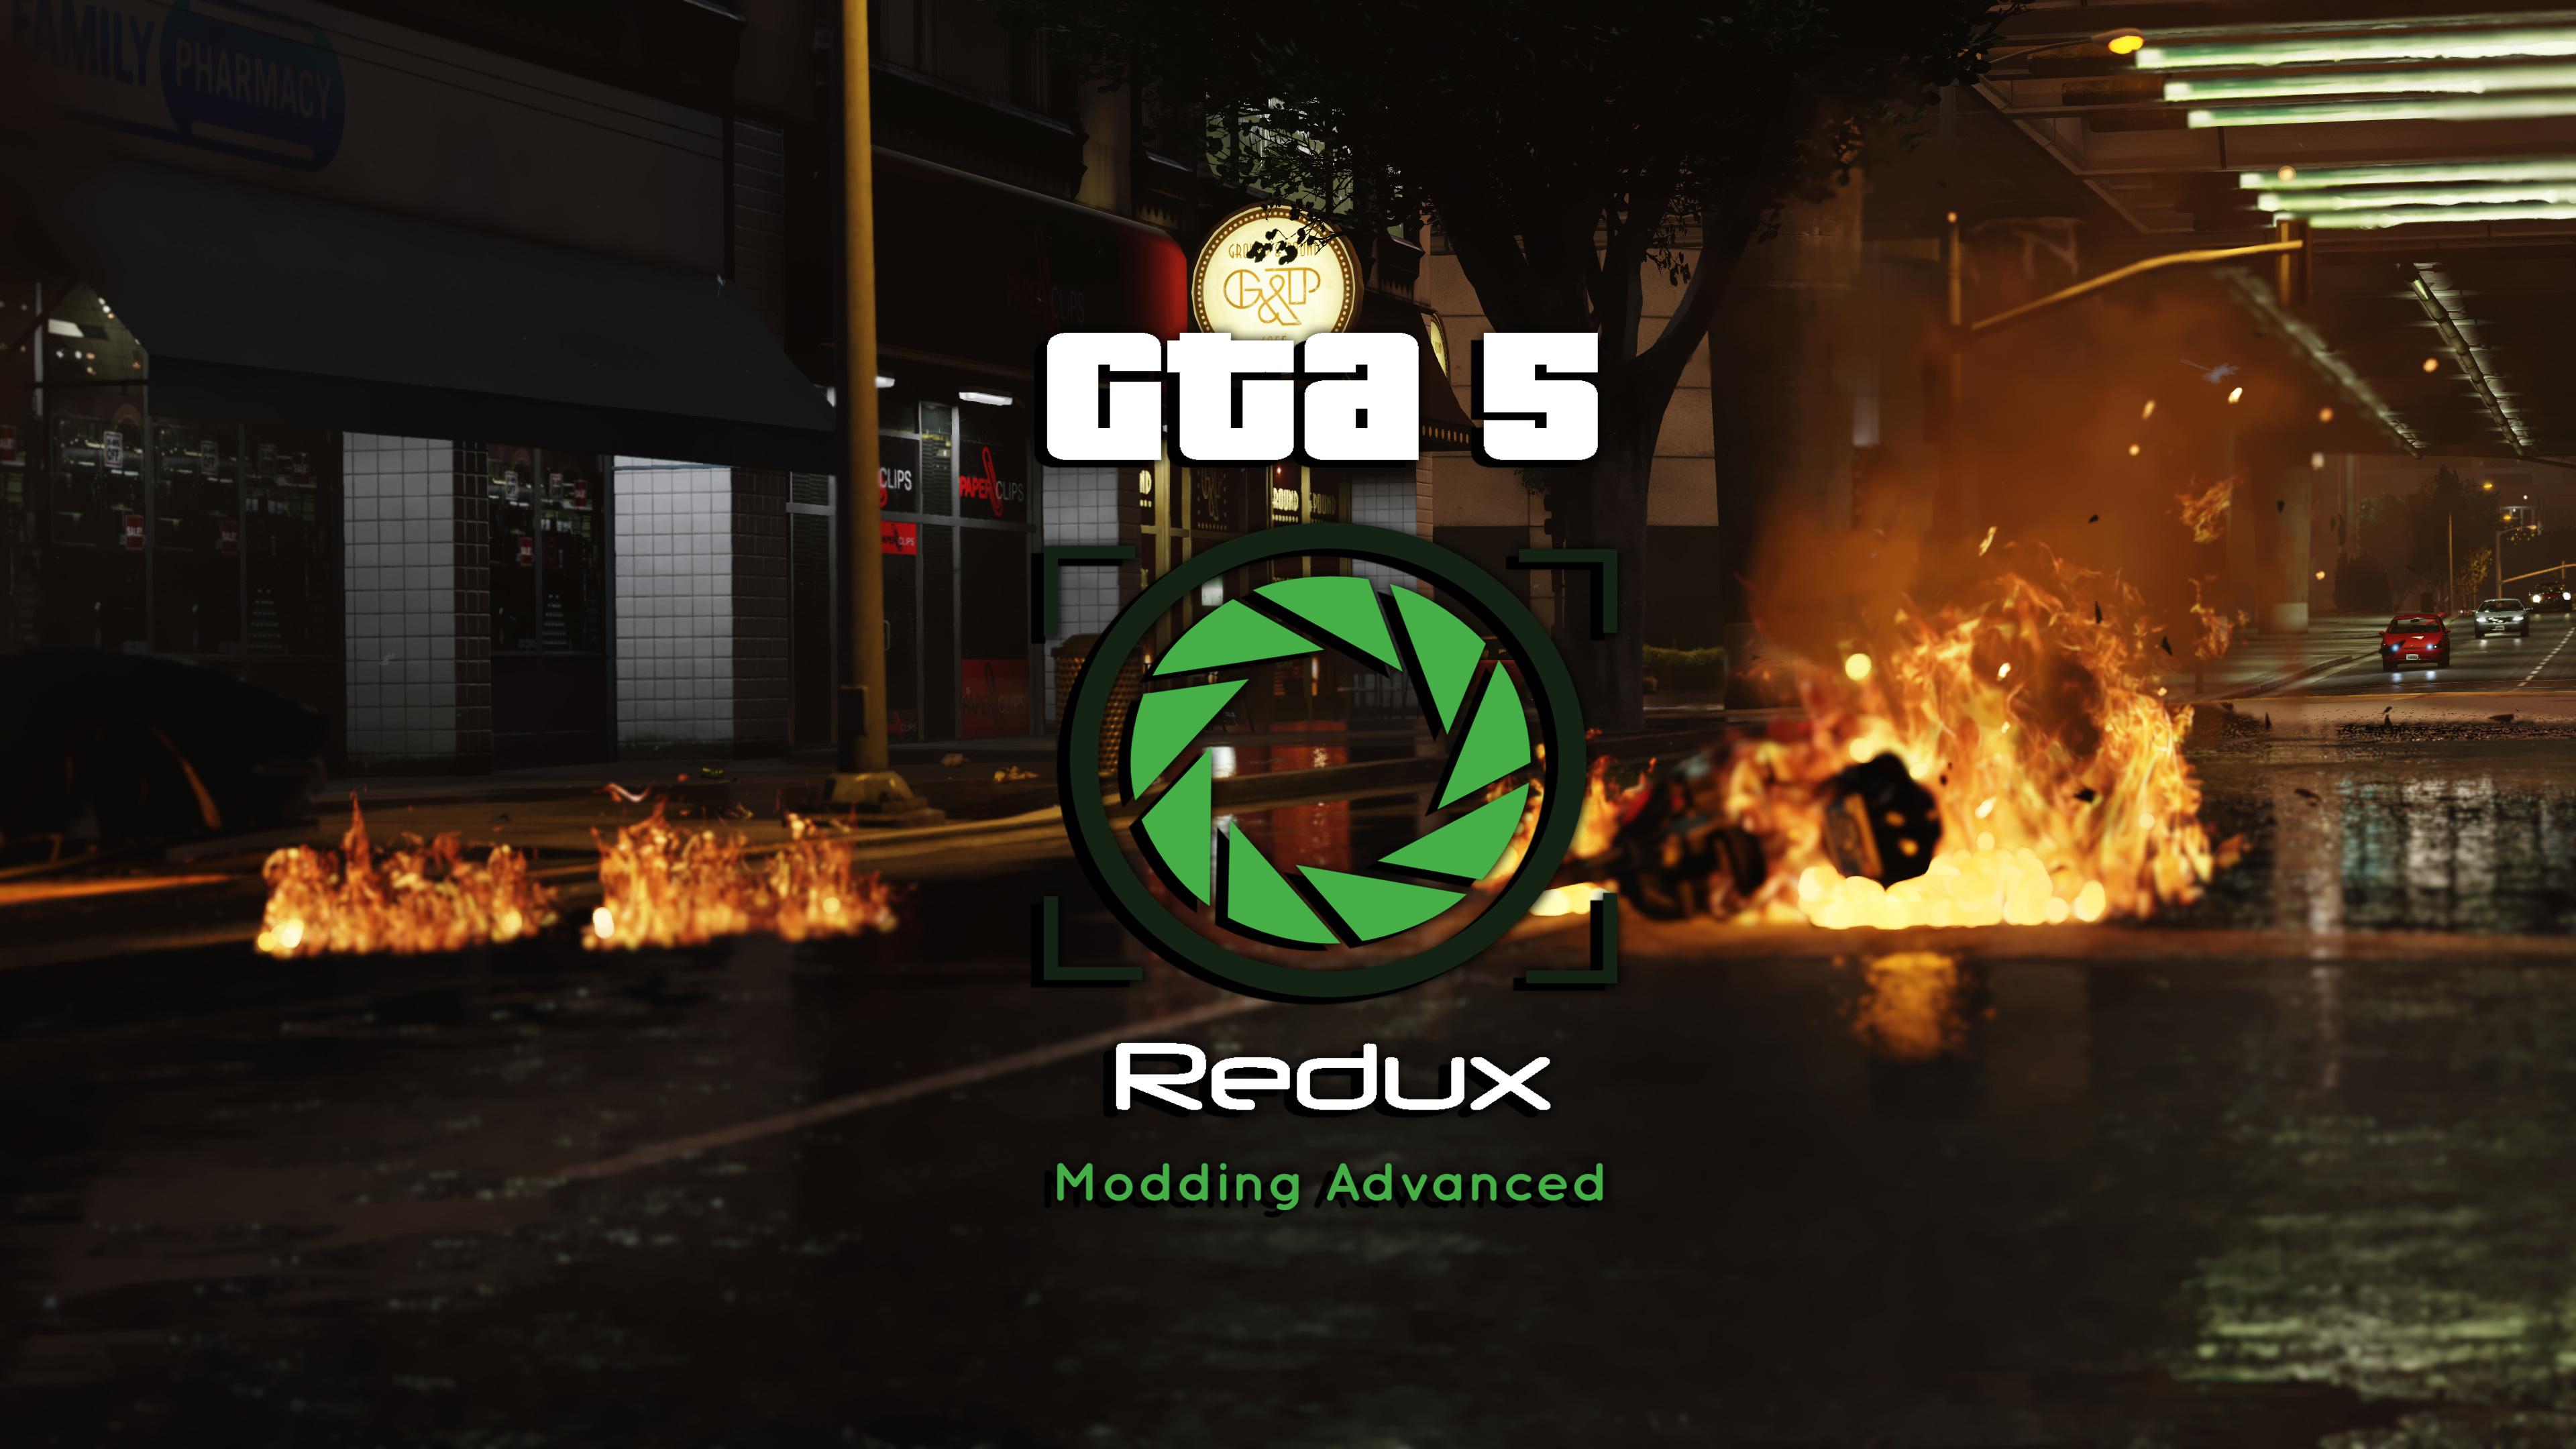 Gta 5 best launch options steam